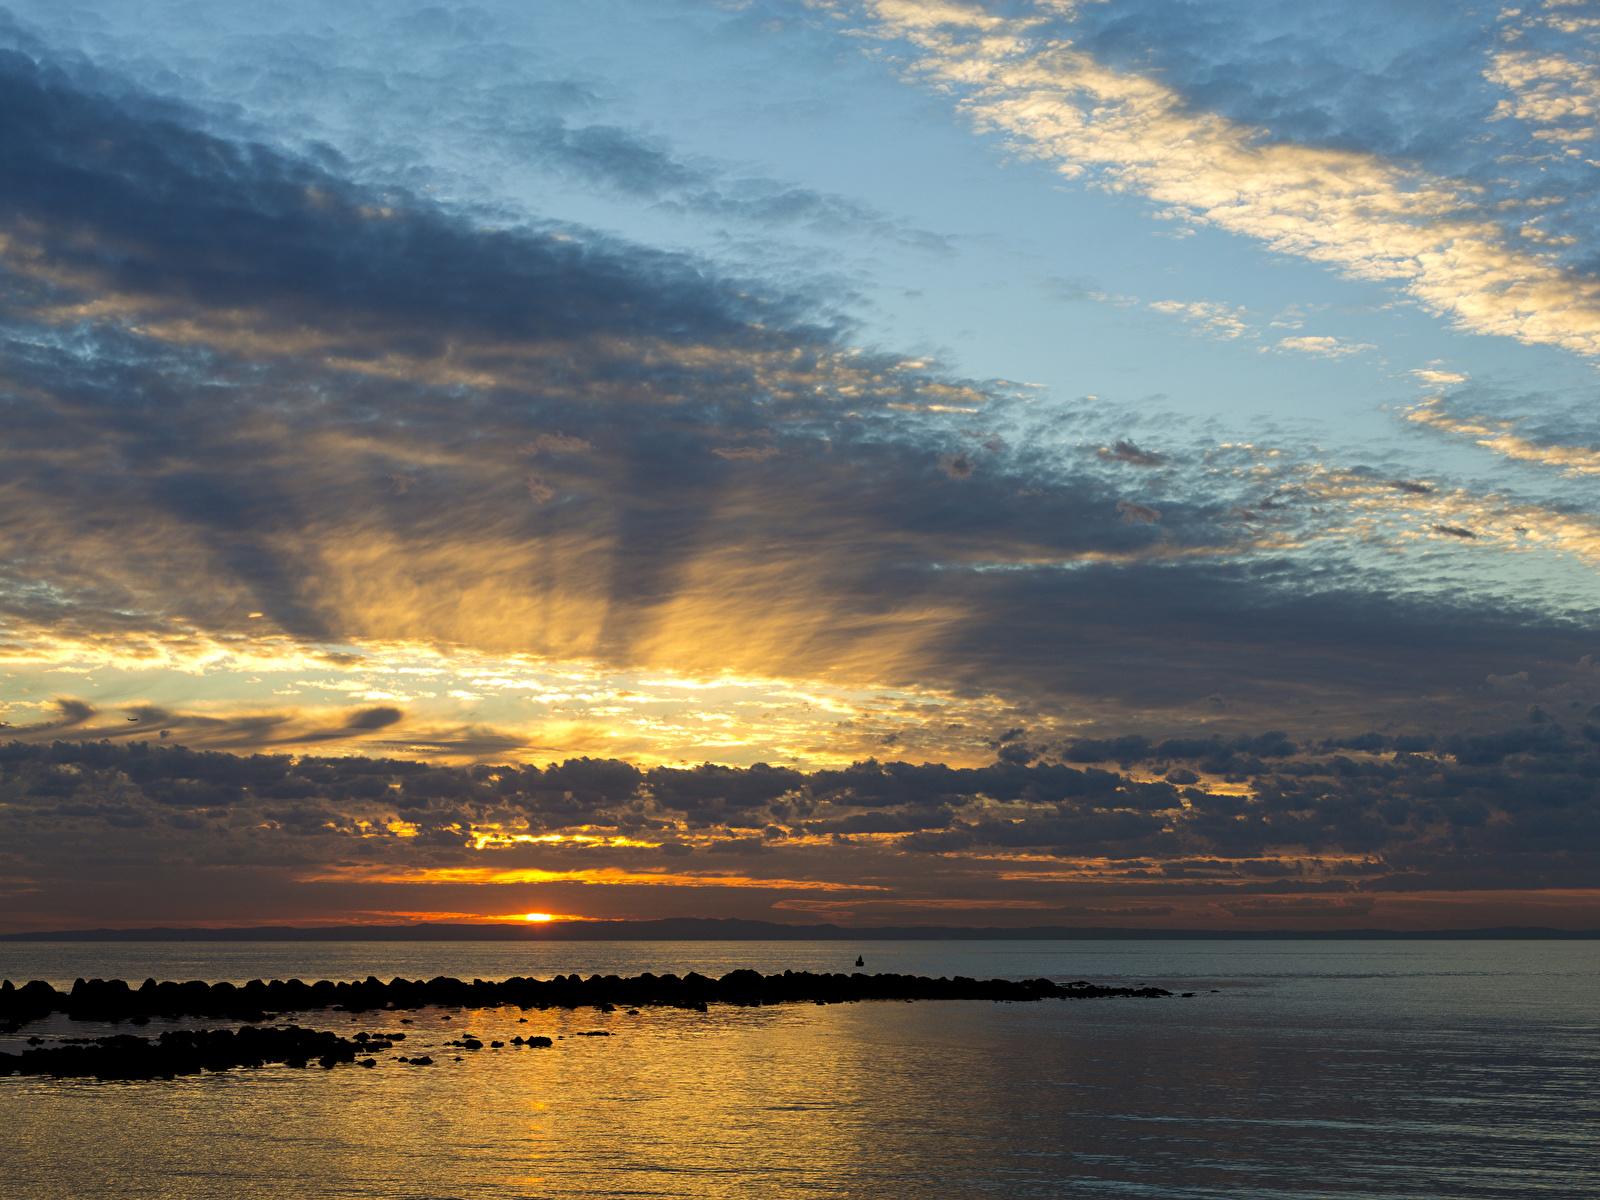 Фото Австралия Queensland Море Природа Небо рассвет и закат облачно 1600x1200 Рассветы и закаты облако Облака